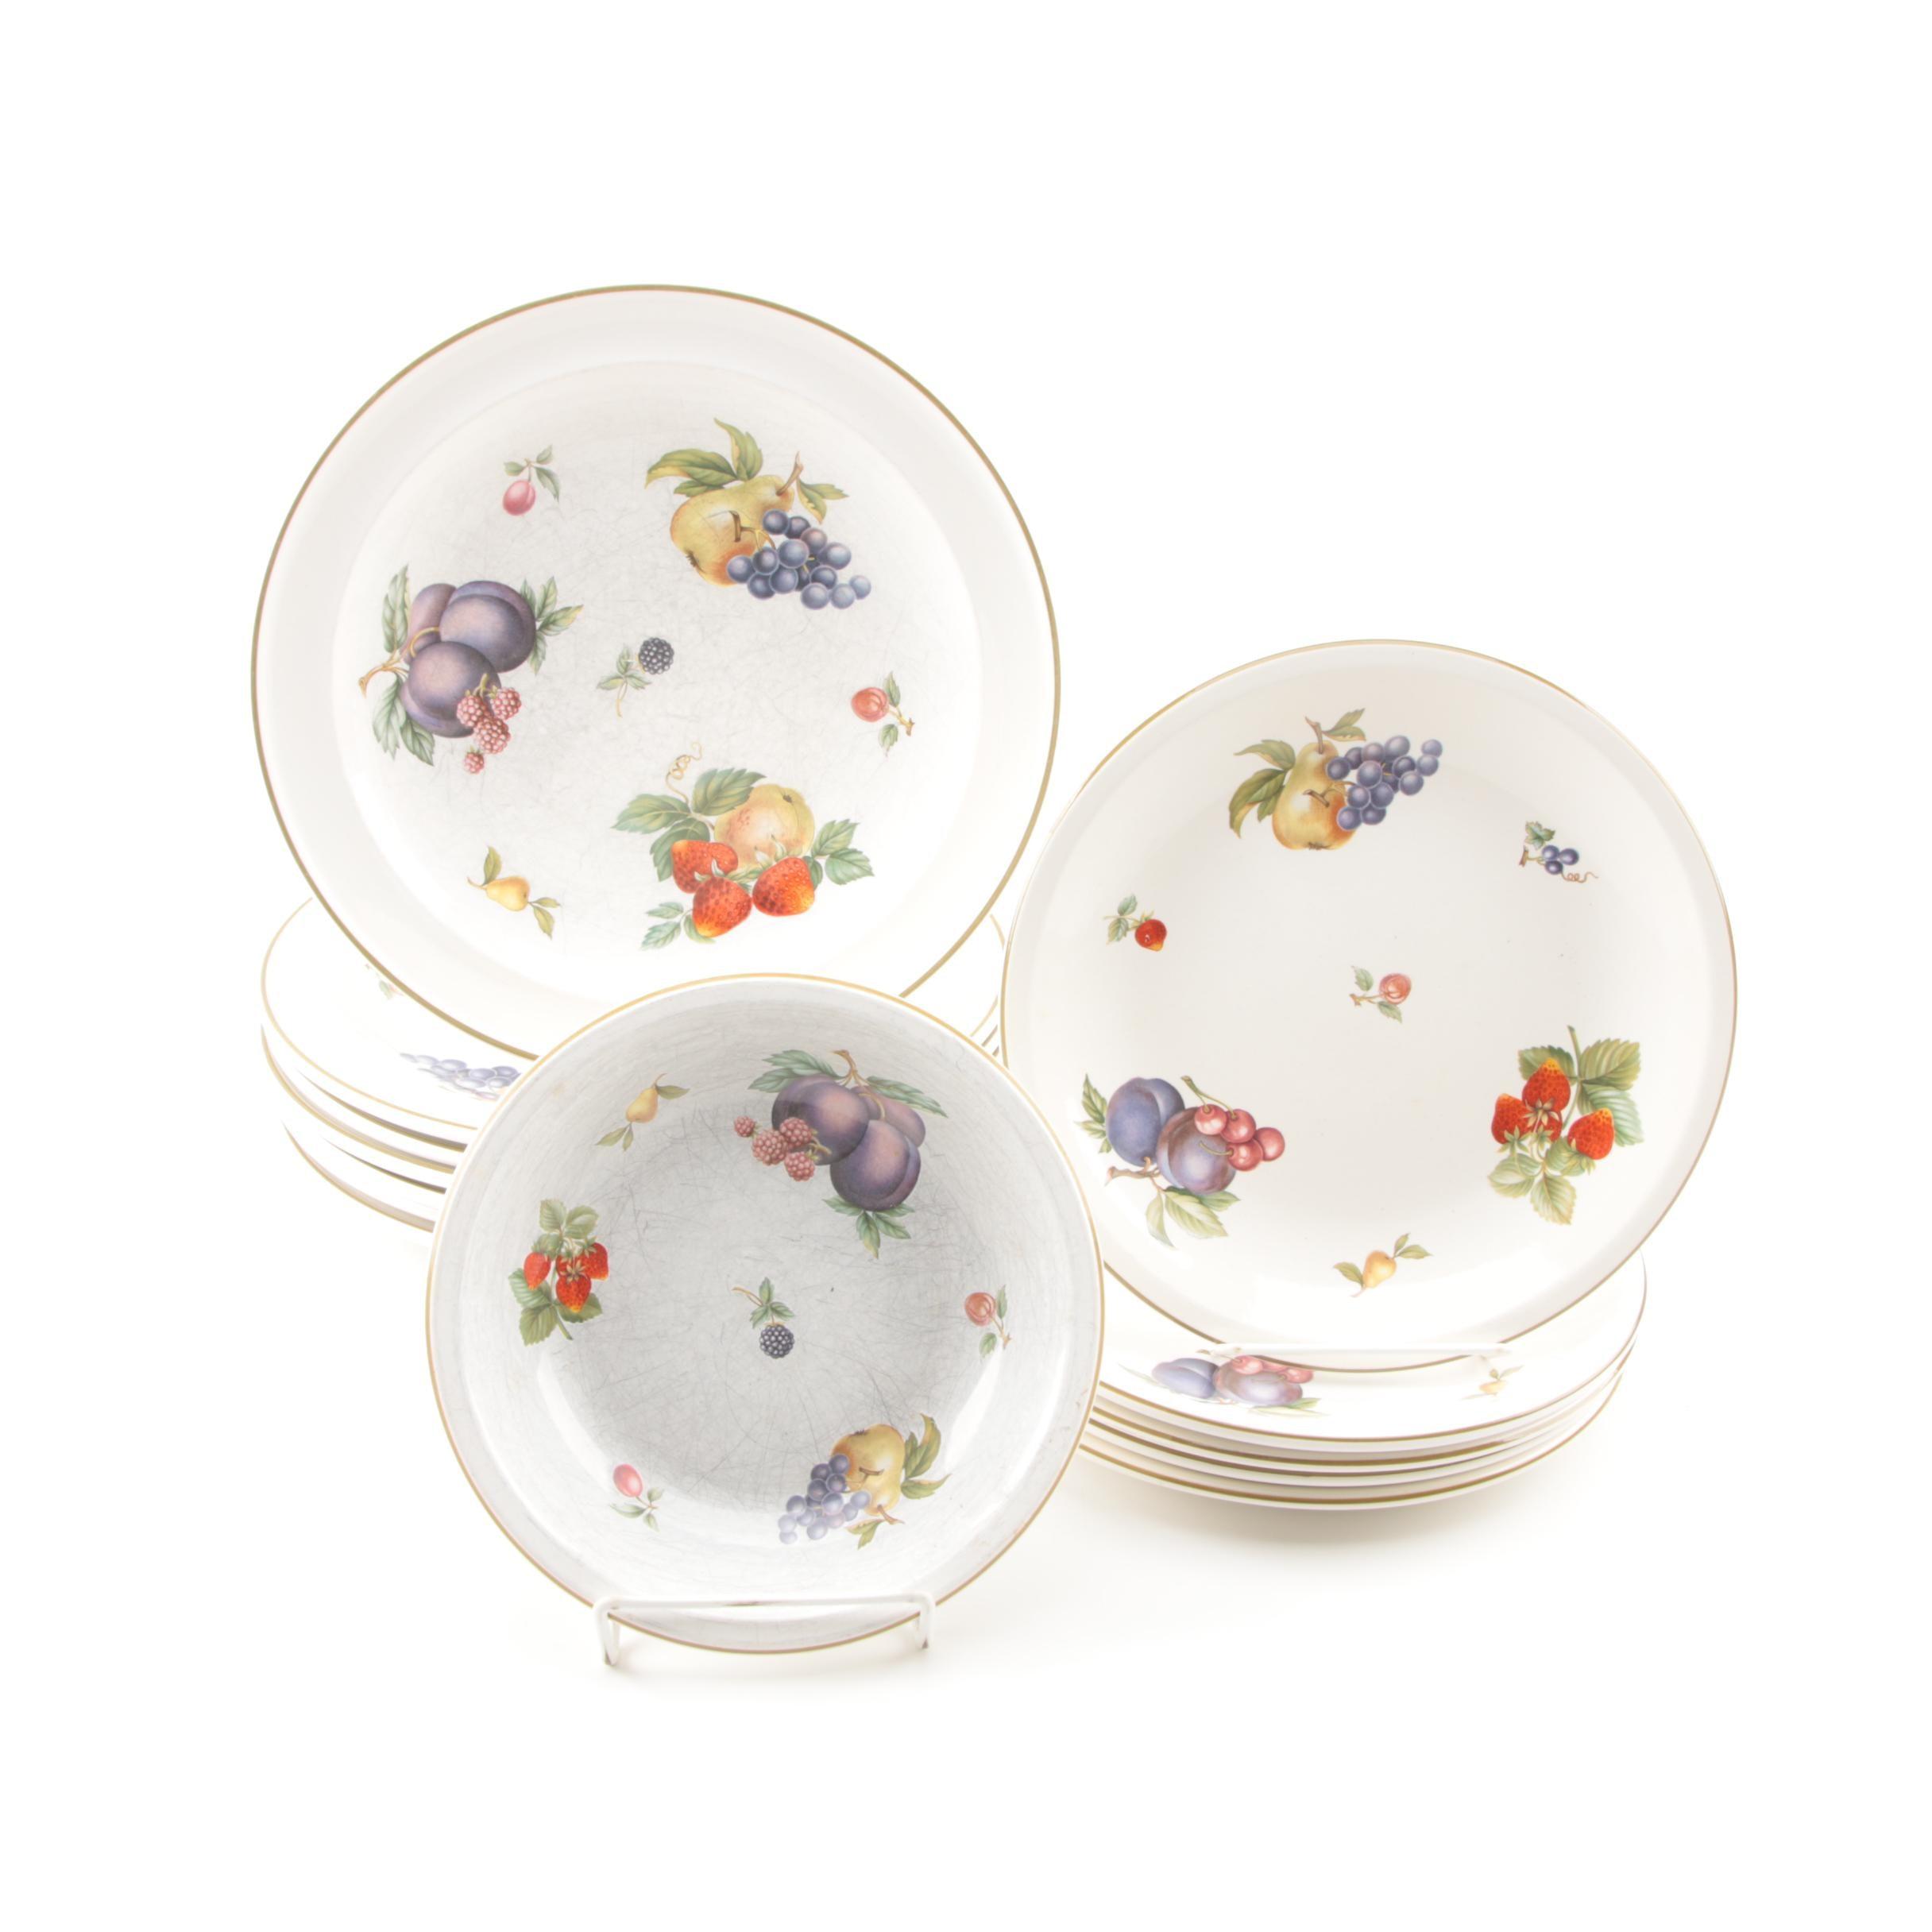 "Wedgwood ""Fruit Sprays"" Porcelain Plates and Bowl"